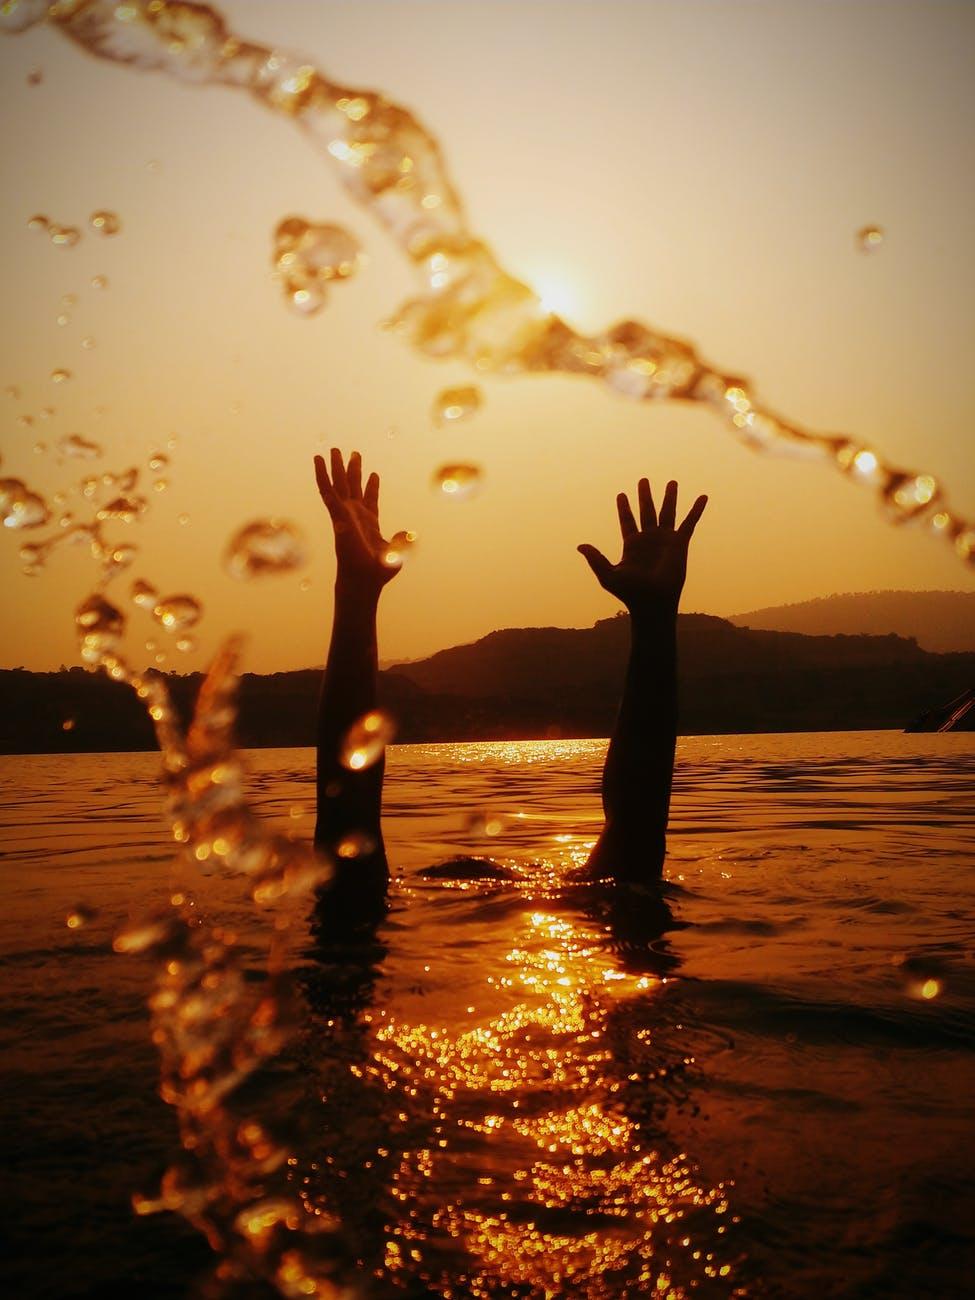 hands above water